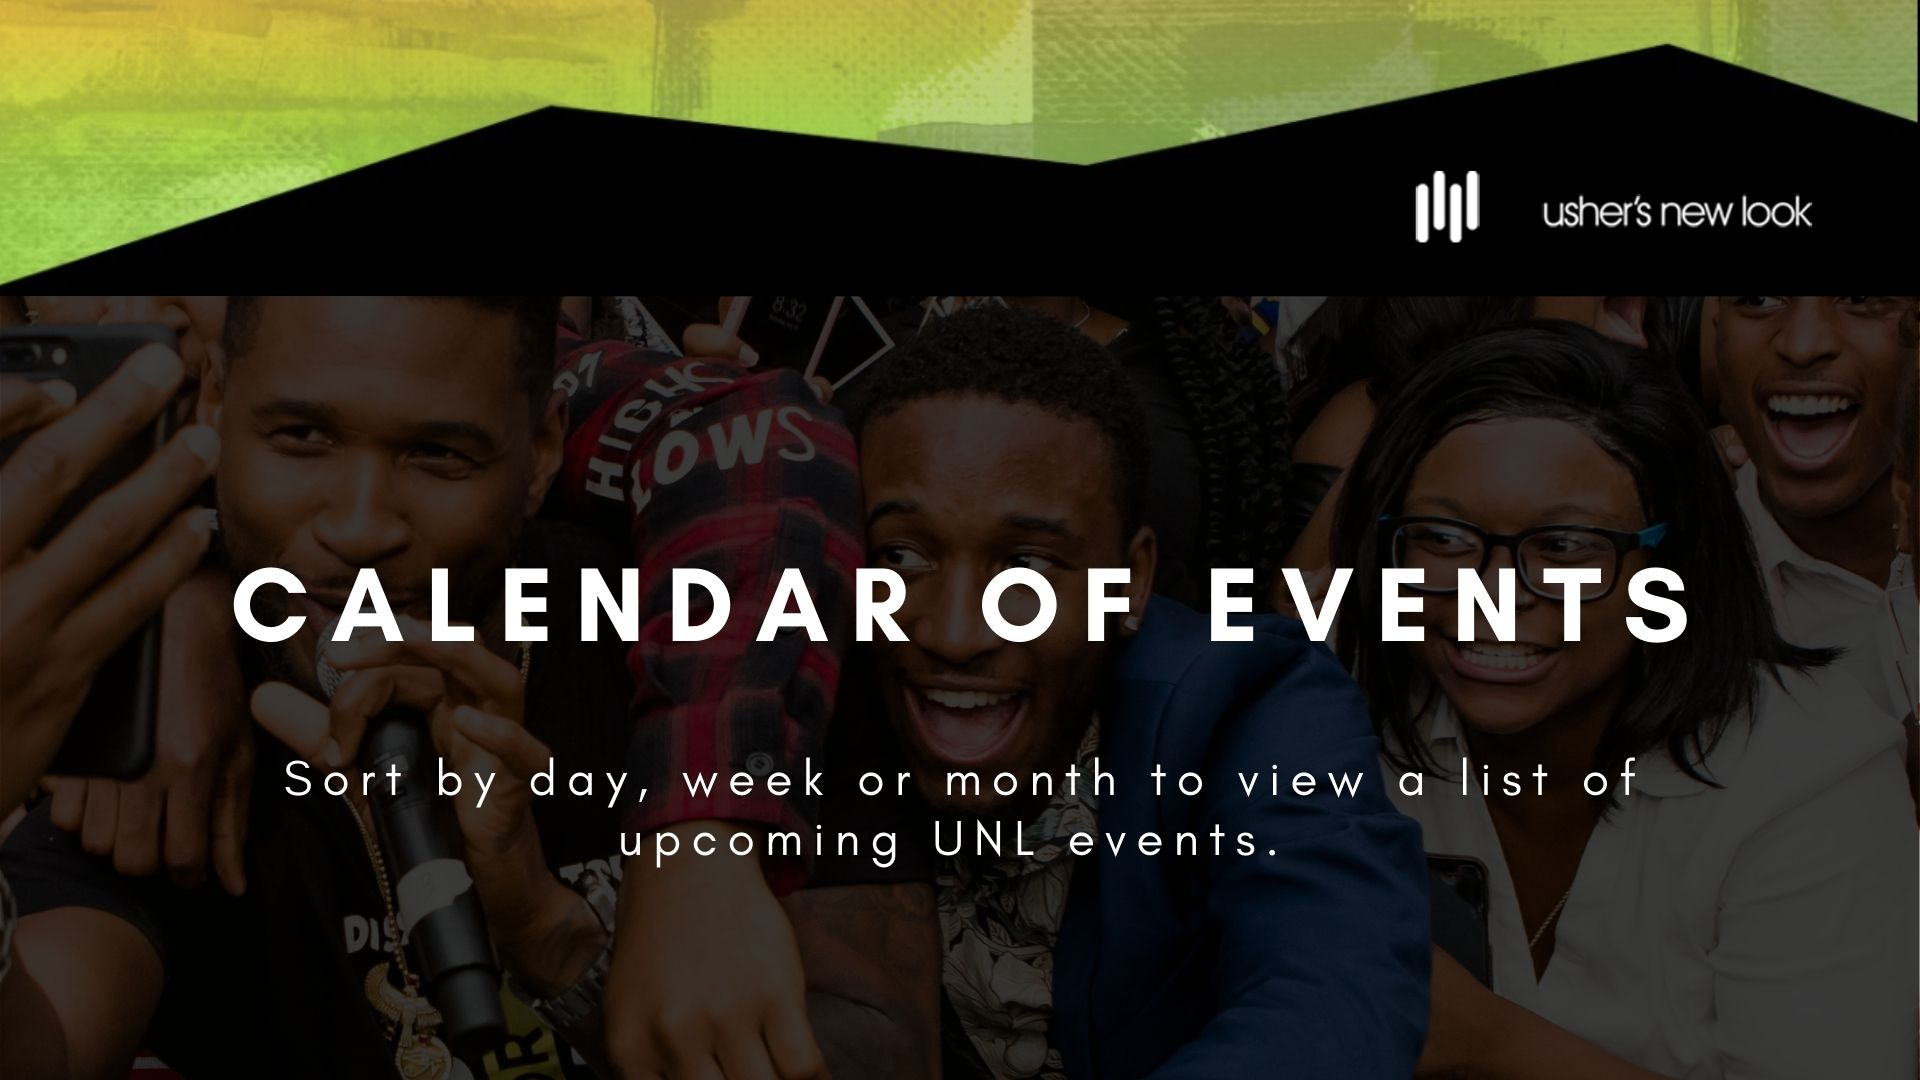 Usher's New Look Events Calendar